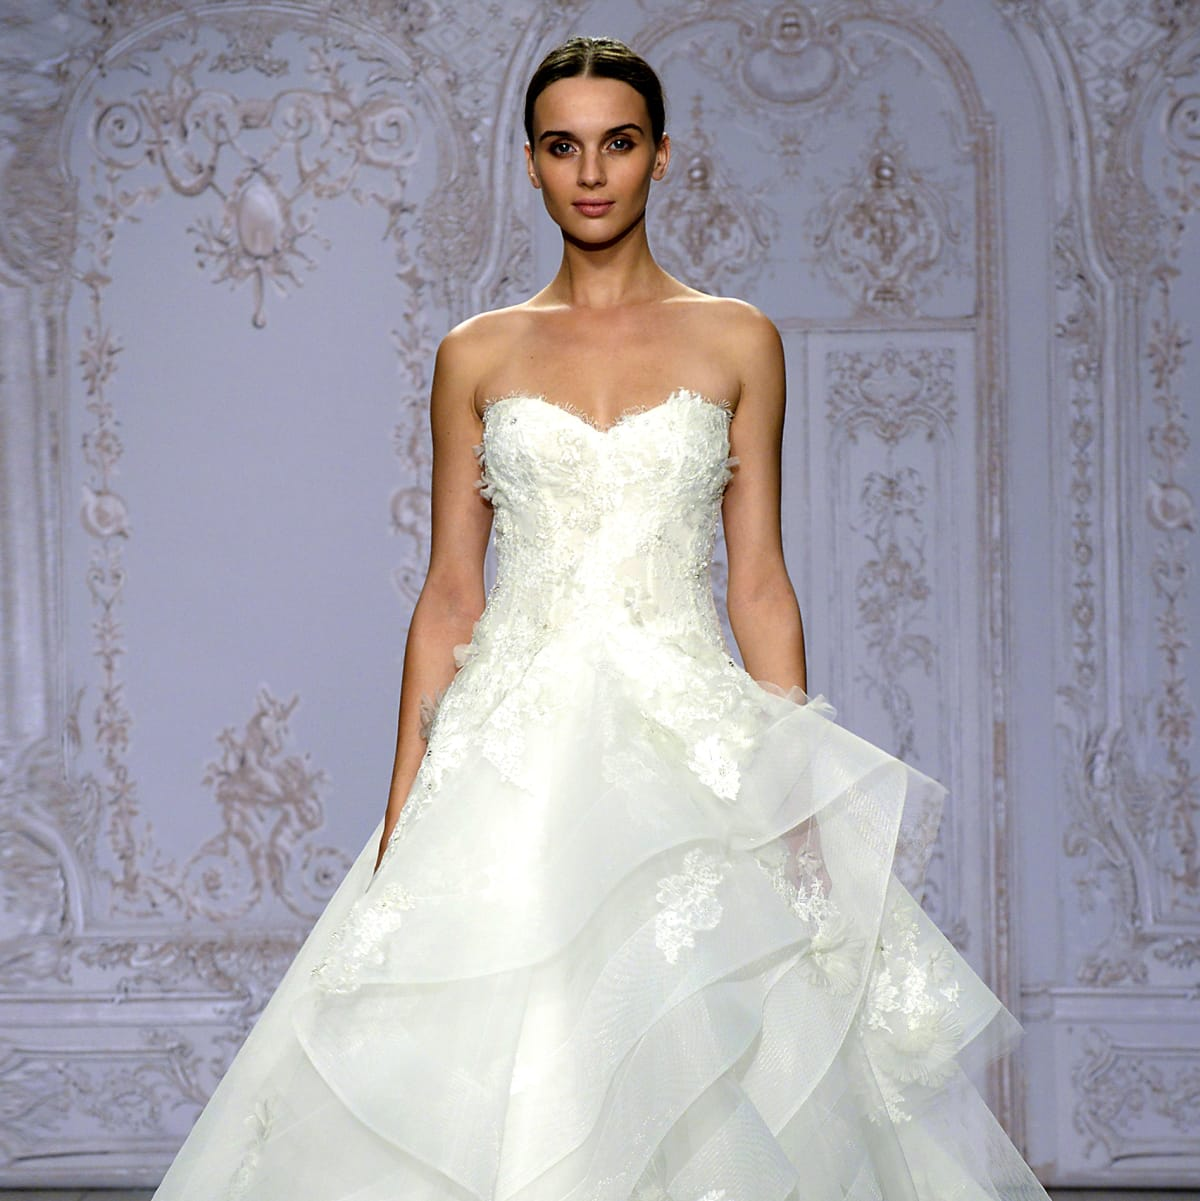 Houston, Joan Pillow, August 2015, wedding gown